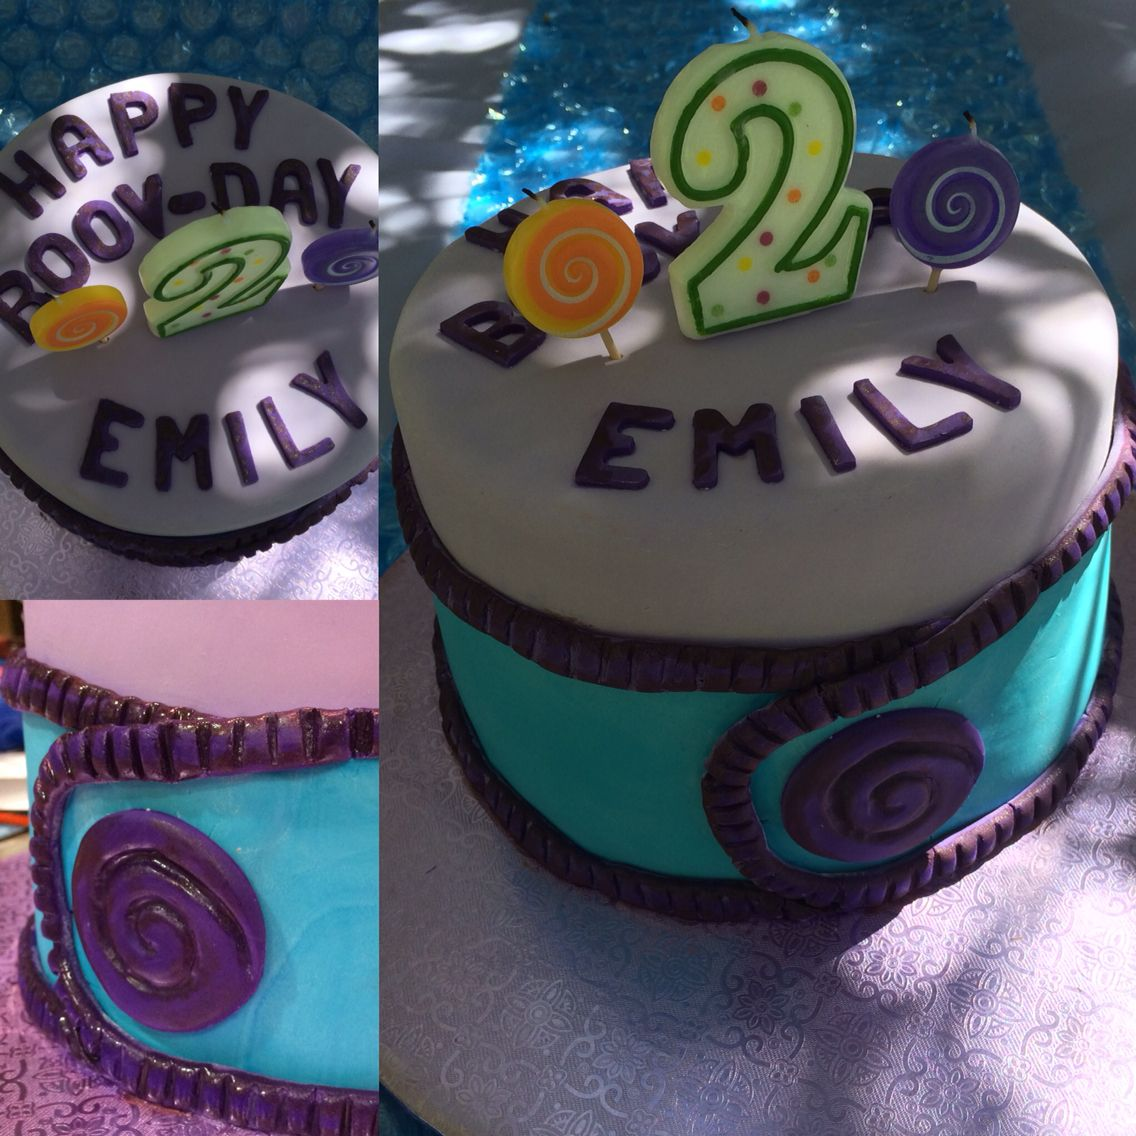 Boov Home Themed Birthday Cake